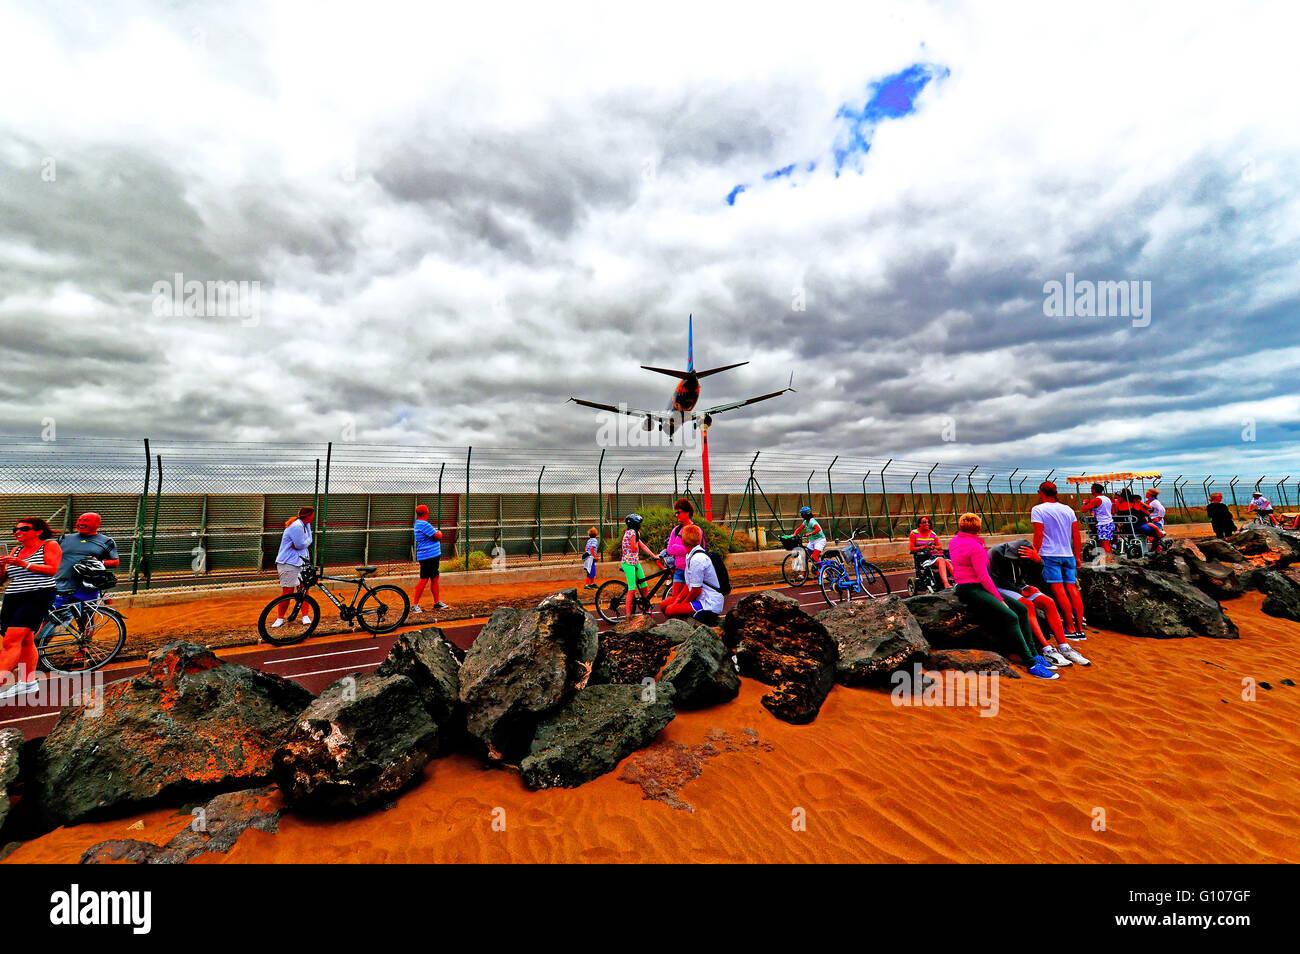 Lanzarote Thompson passenger plane landing at Arrecife airport - Stock Image